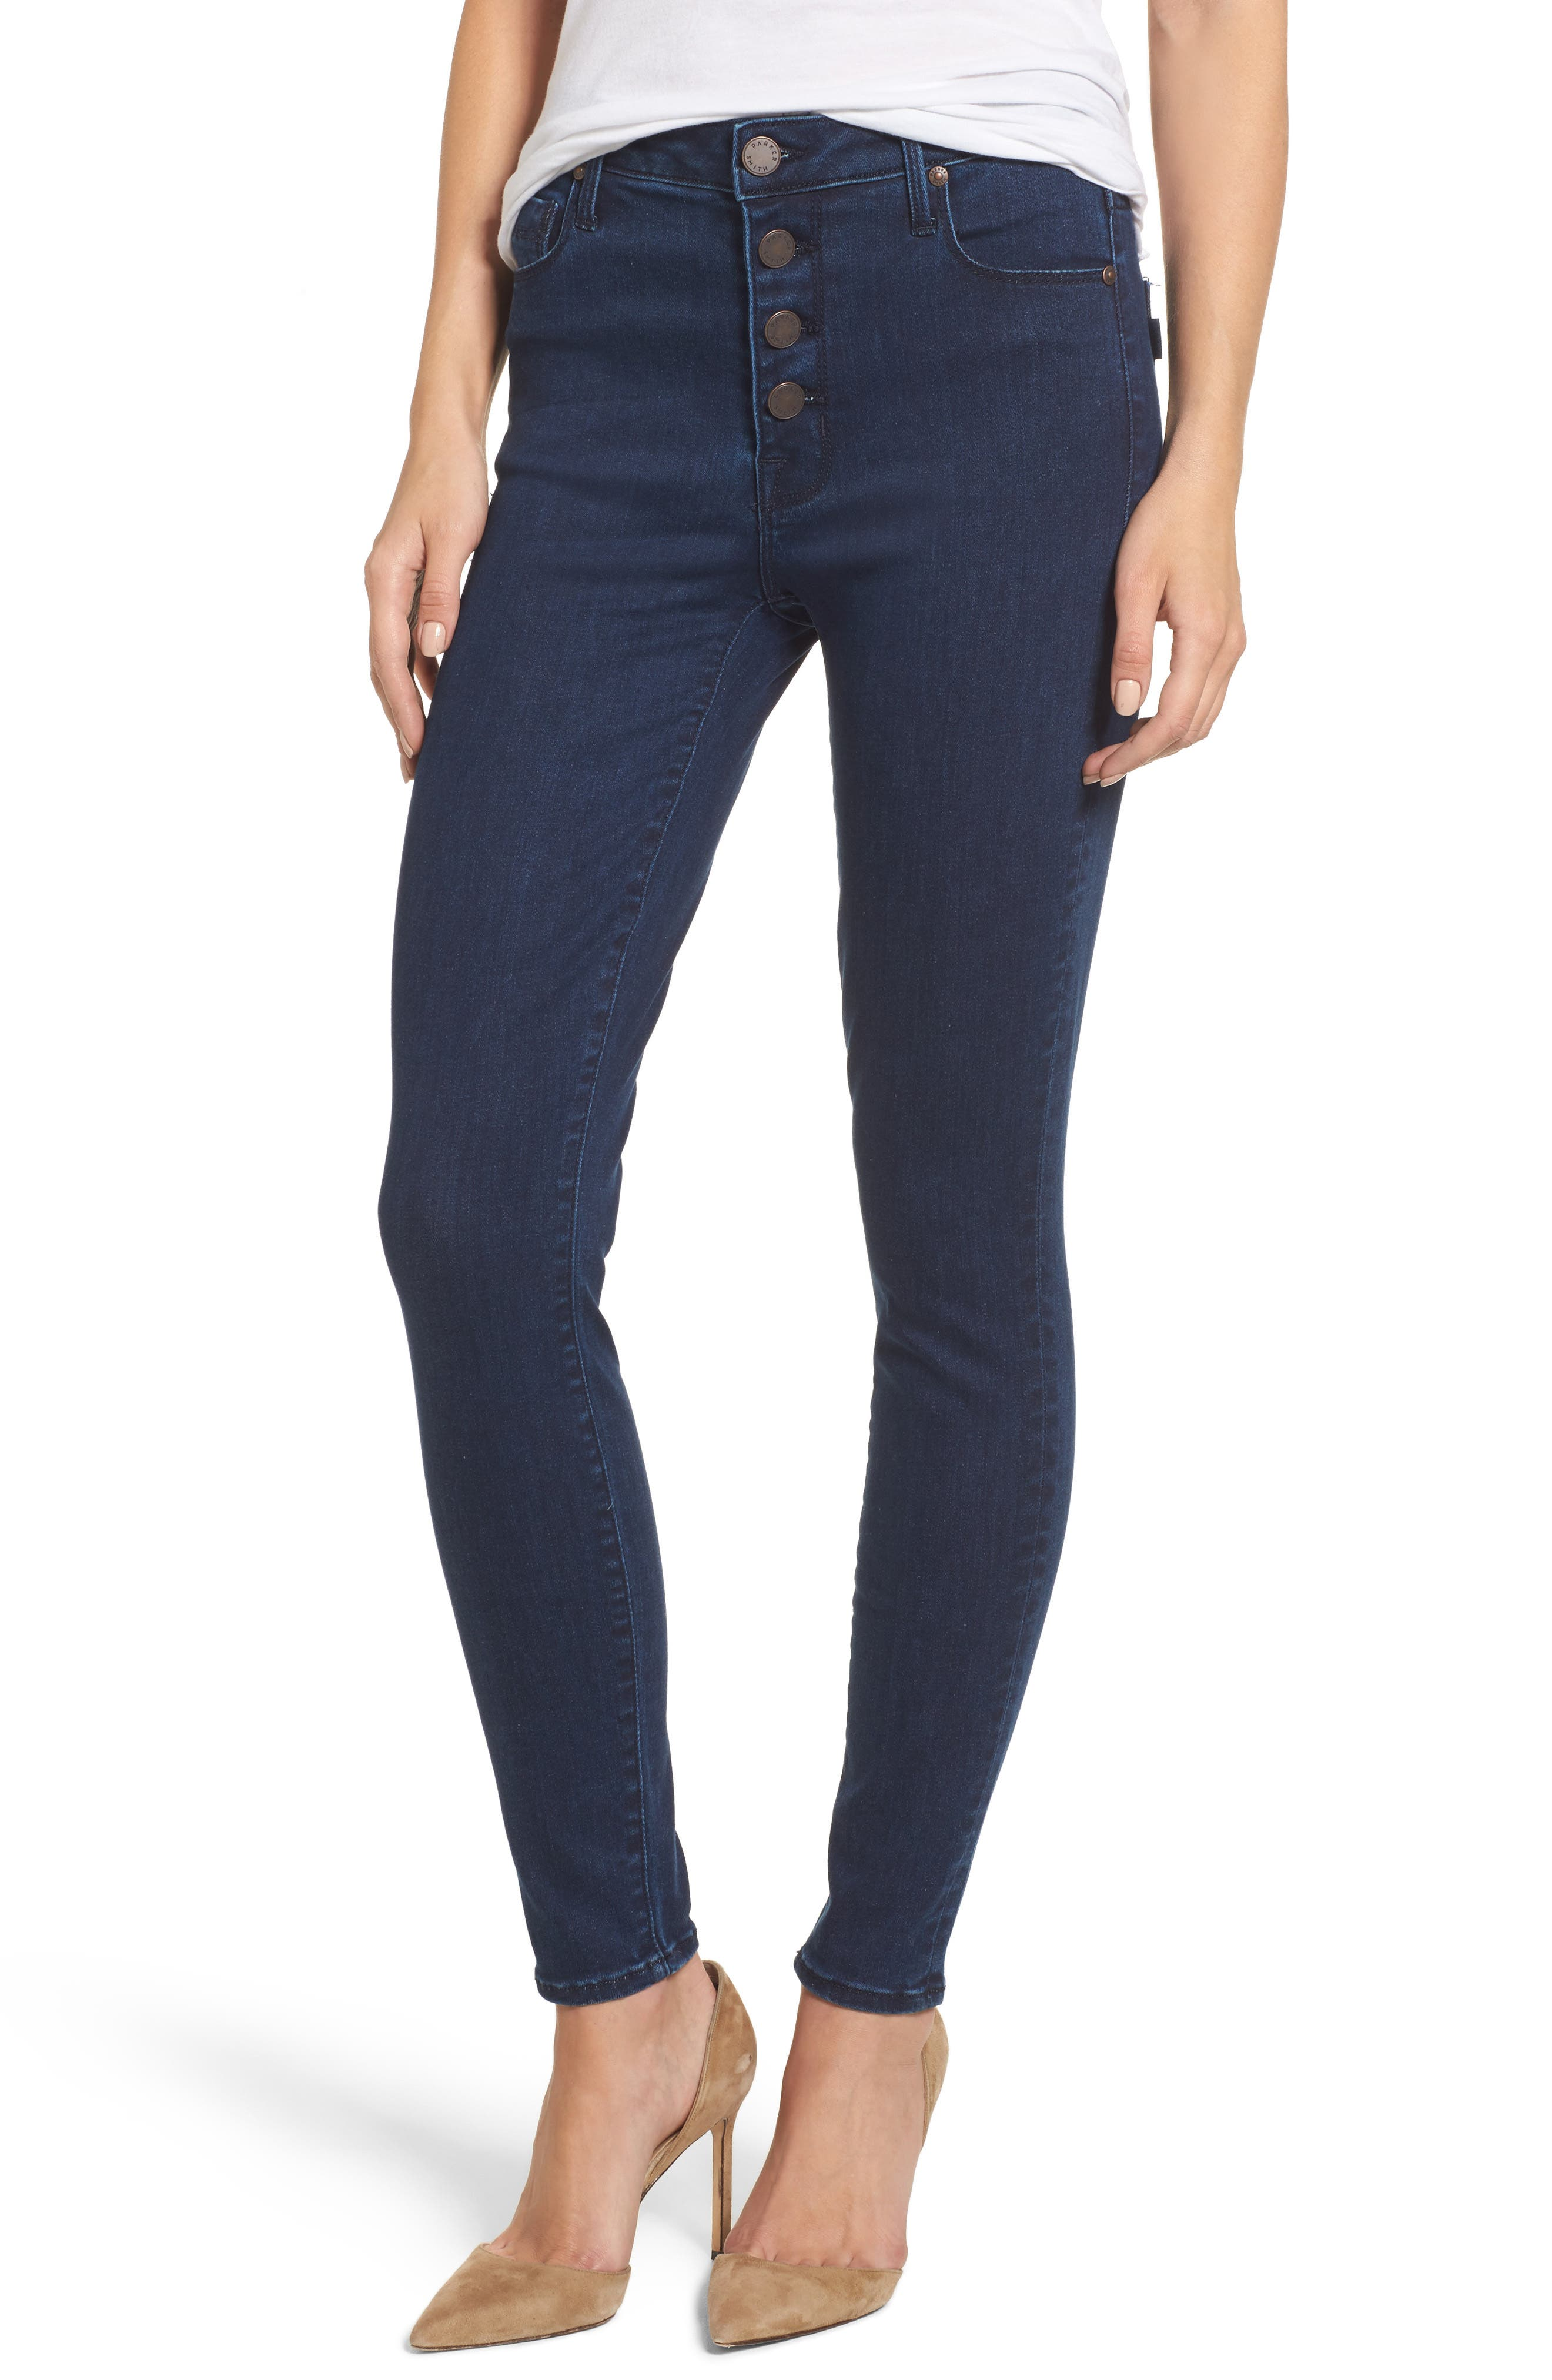 Bombshell High Waist Skinny Jeans,                             Main thumbnail 1, color,                             401